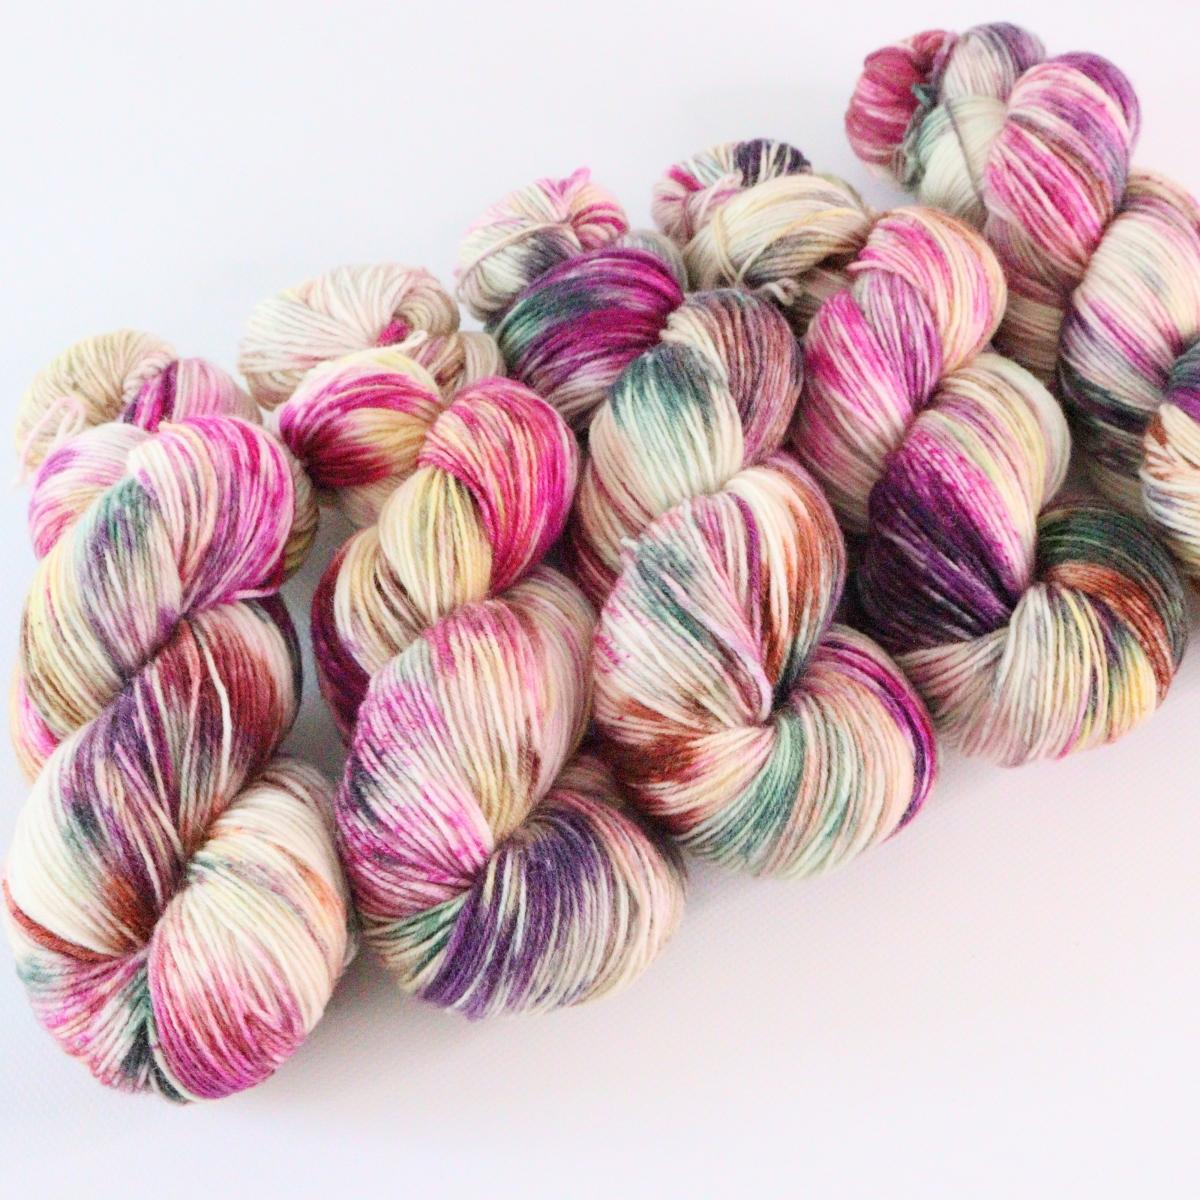 woodico.pro hand dyed yarn 070 2 1200x1200 - Hand dyed yarn / 070